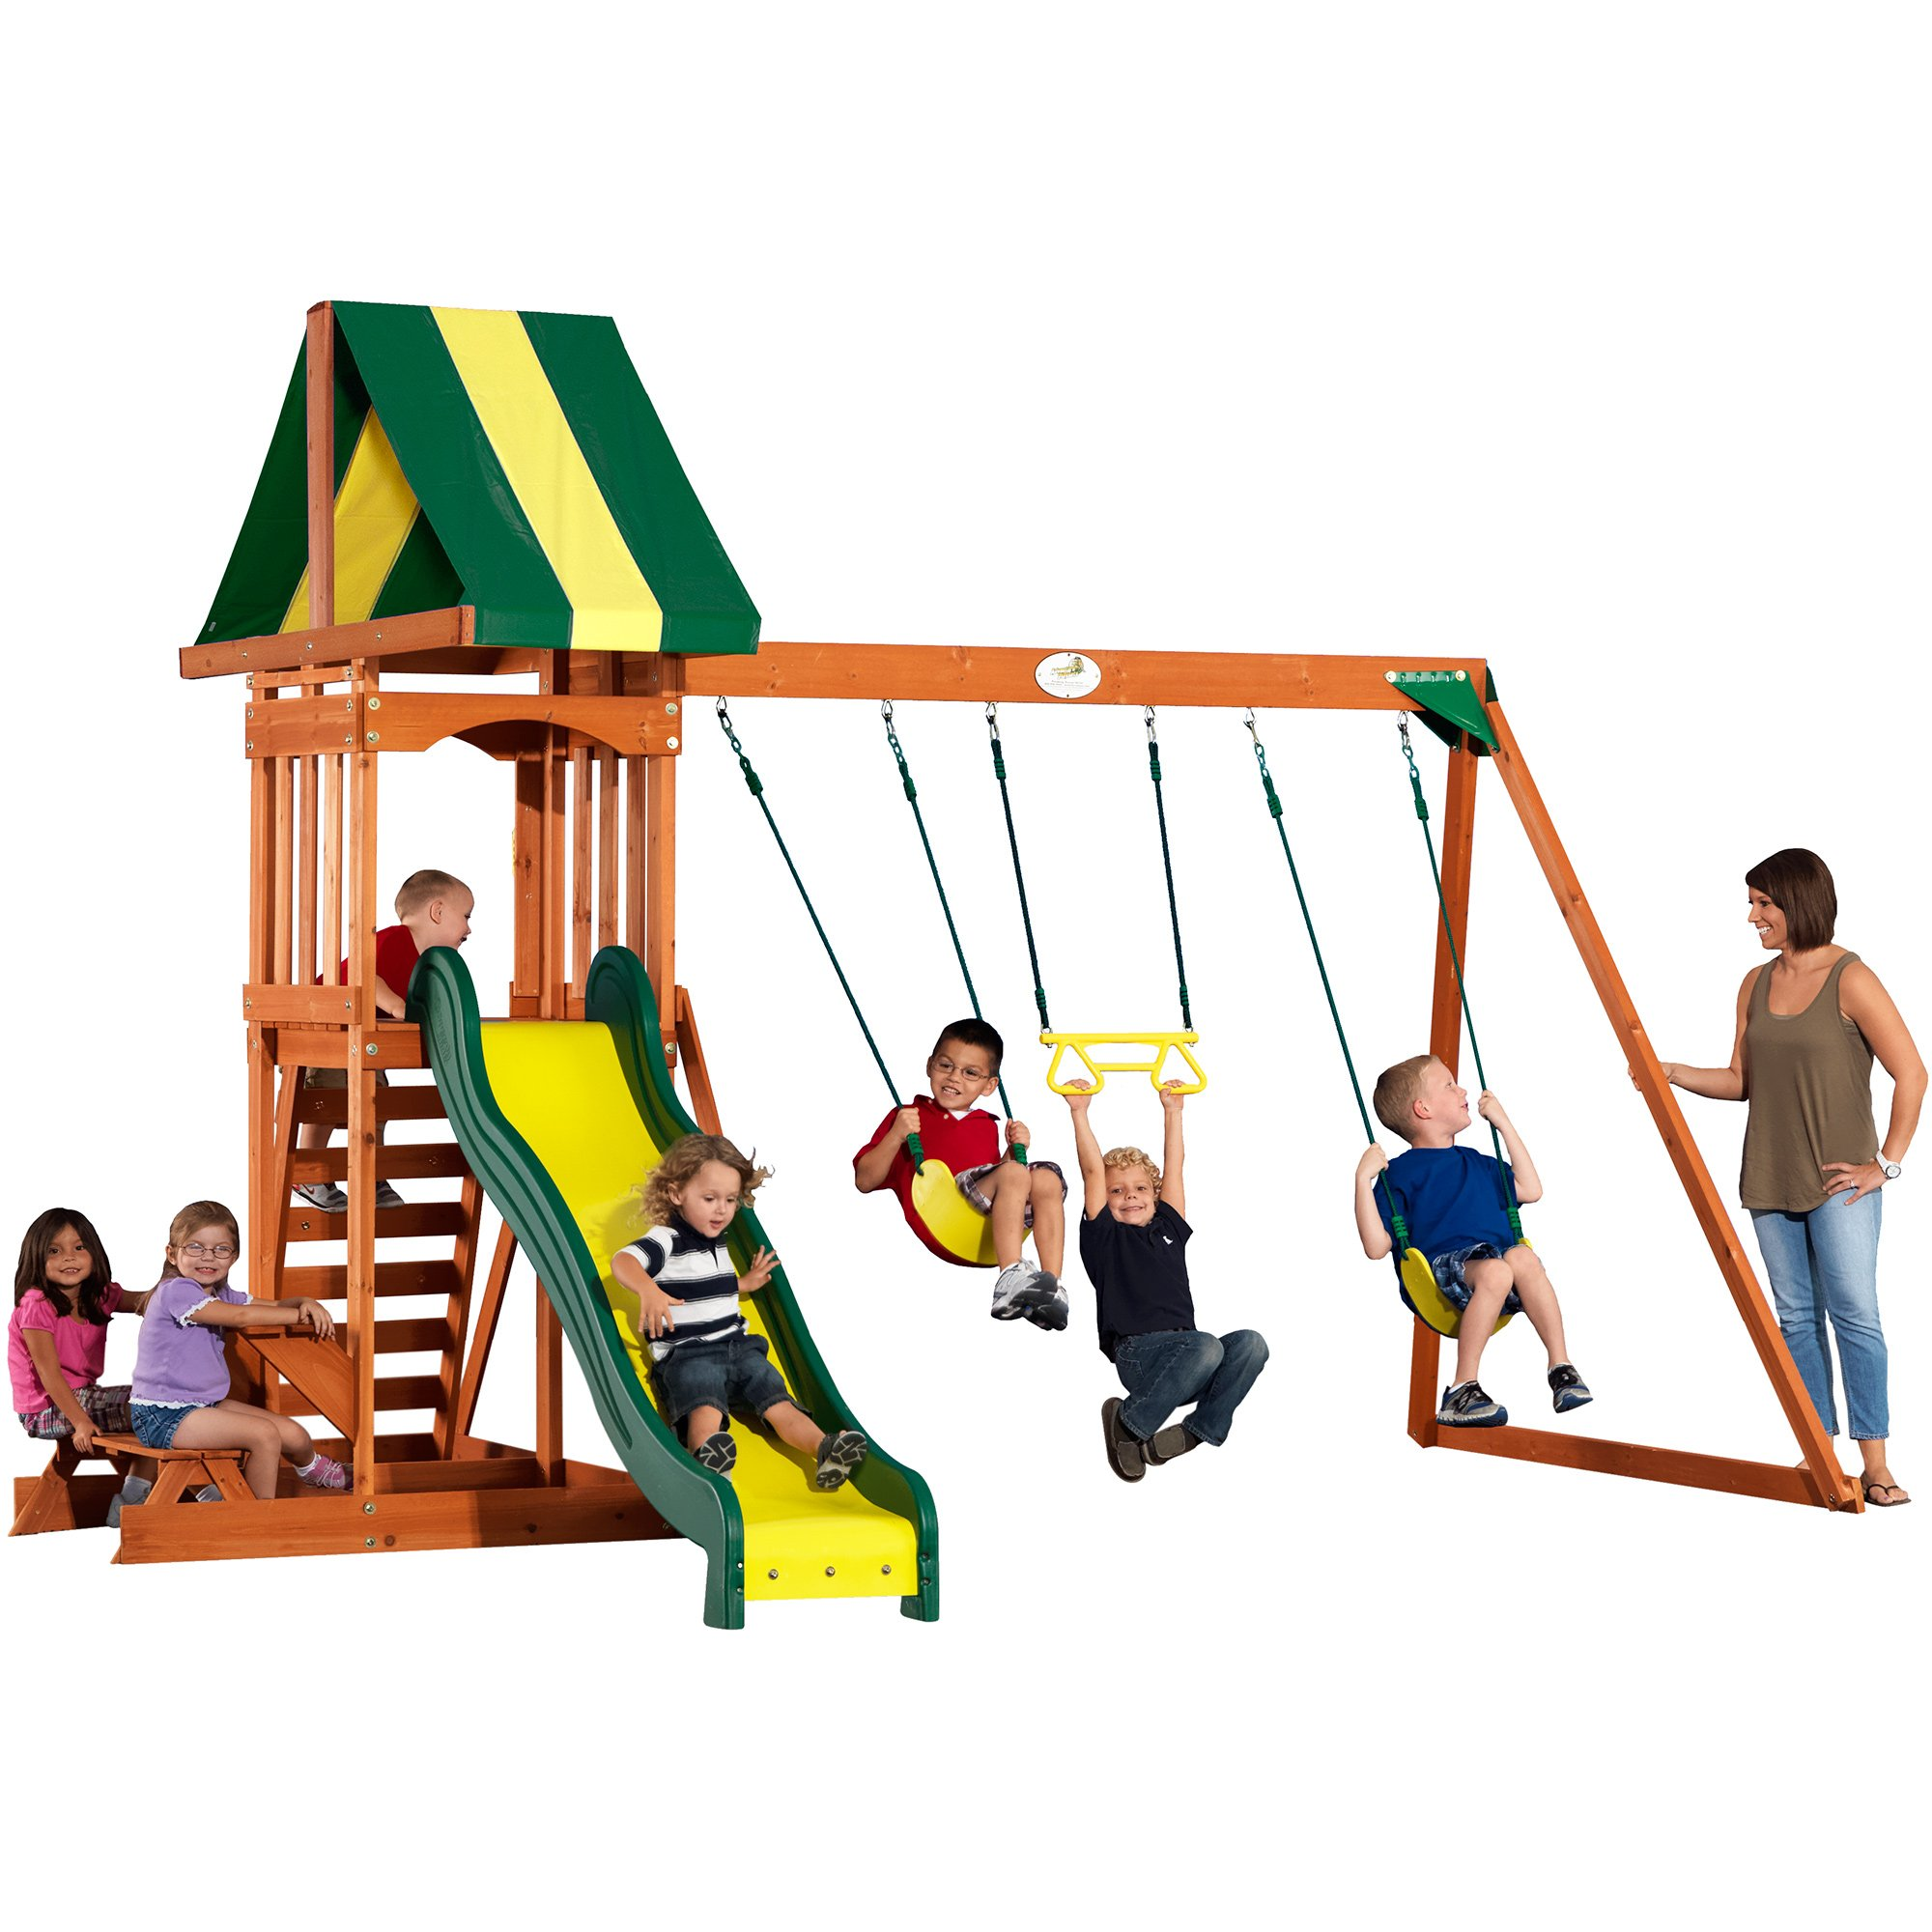 Backyard Discovery Prestige All Cedar Wood Playset Swing Set by Backyard Discovery